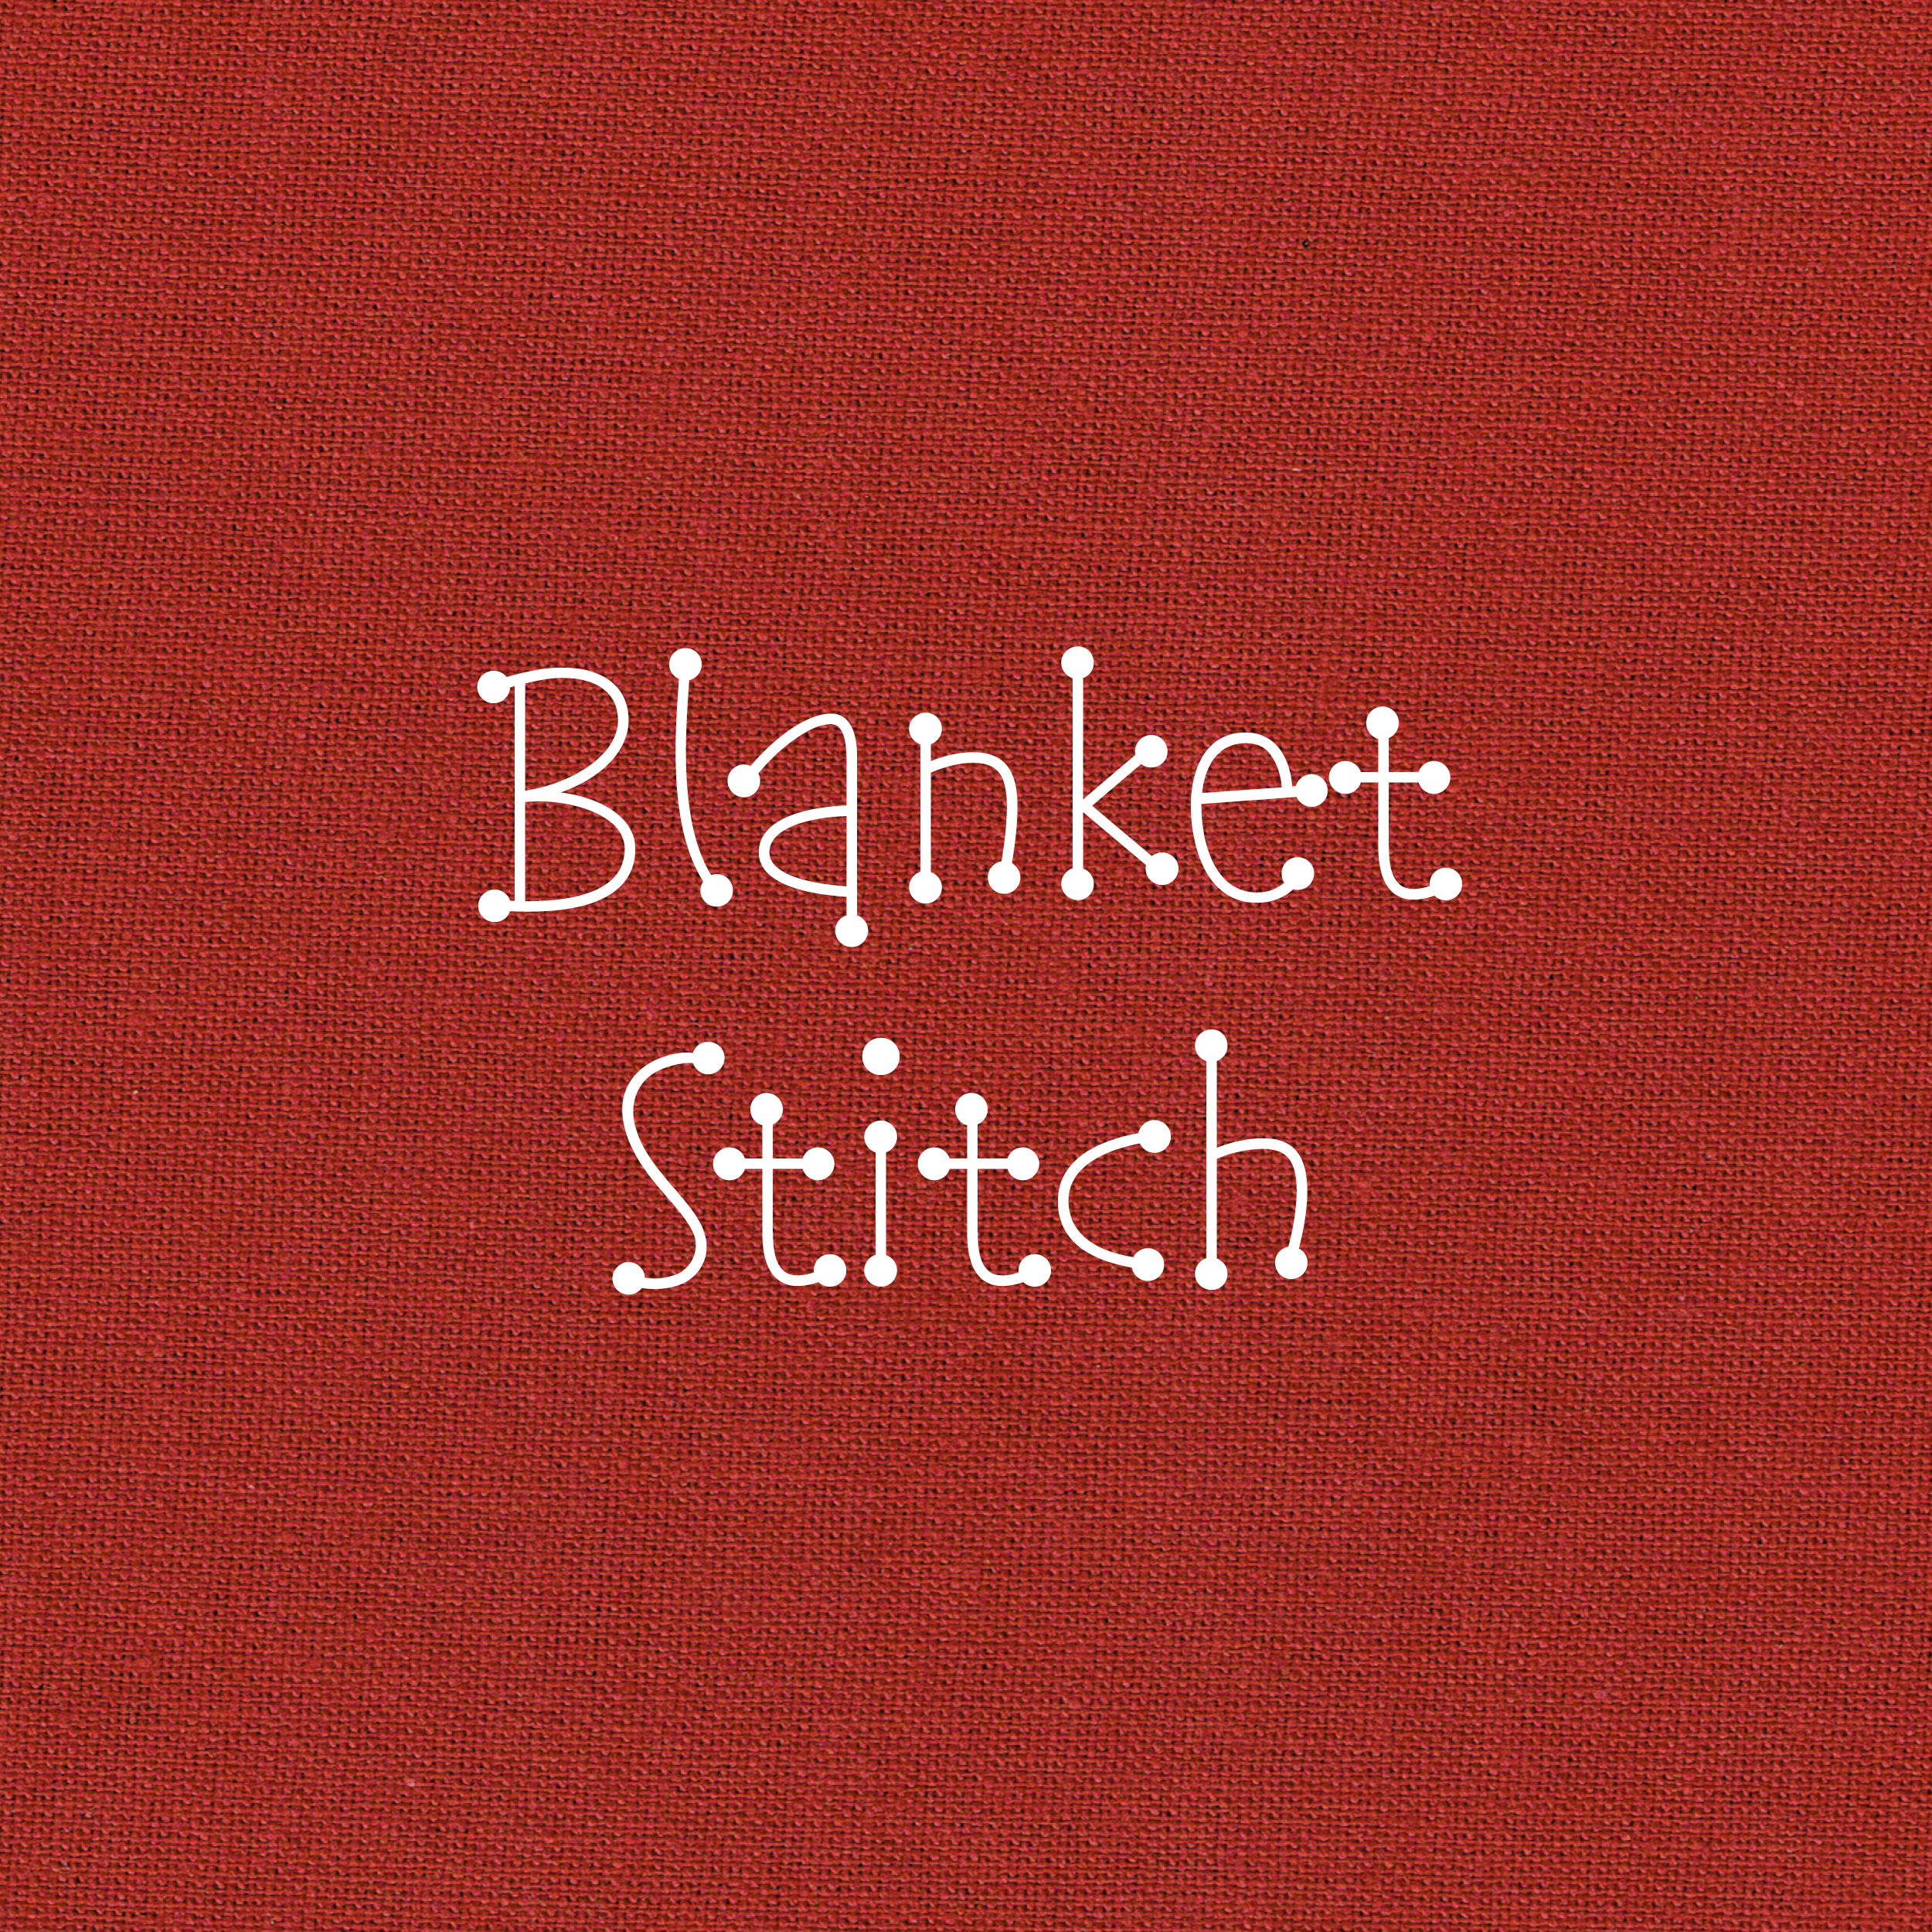 Stitch SQuares7.jpg